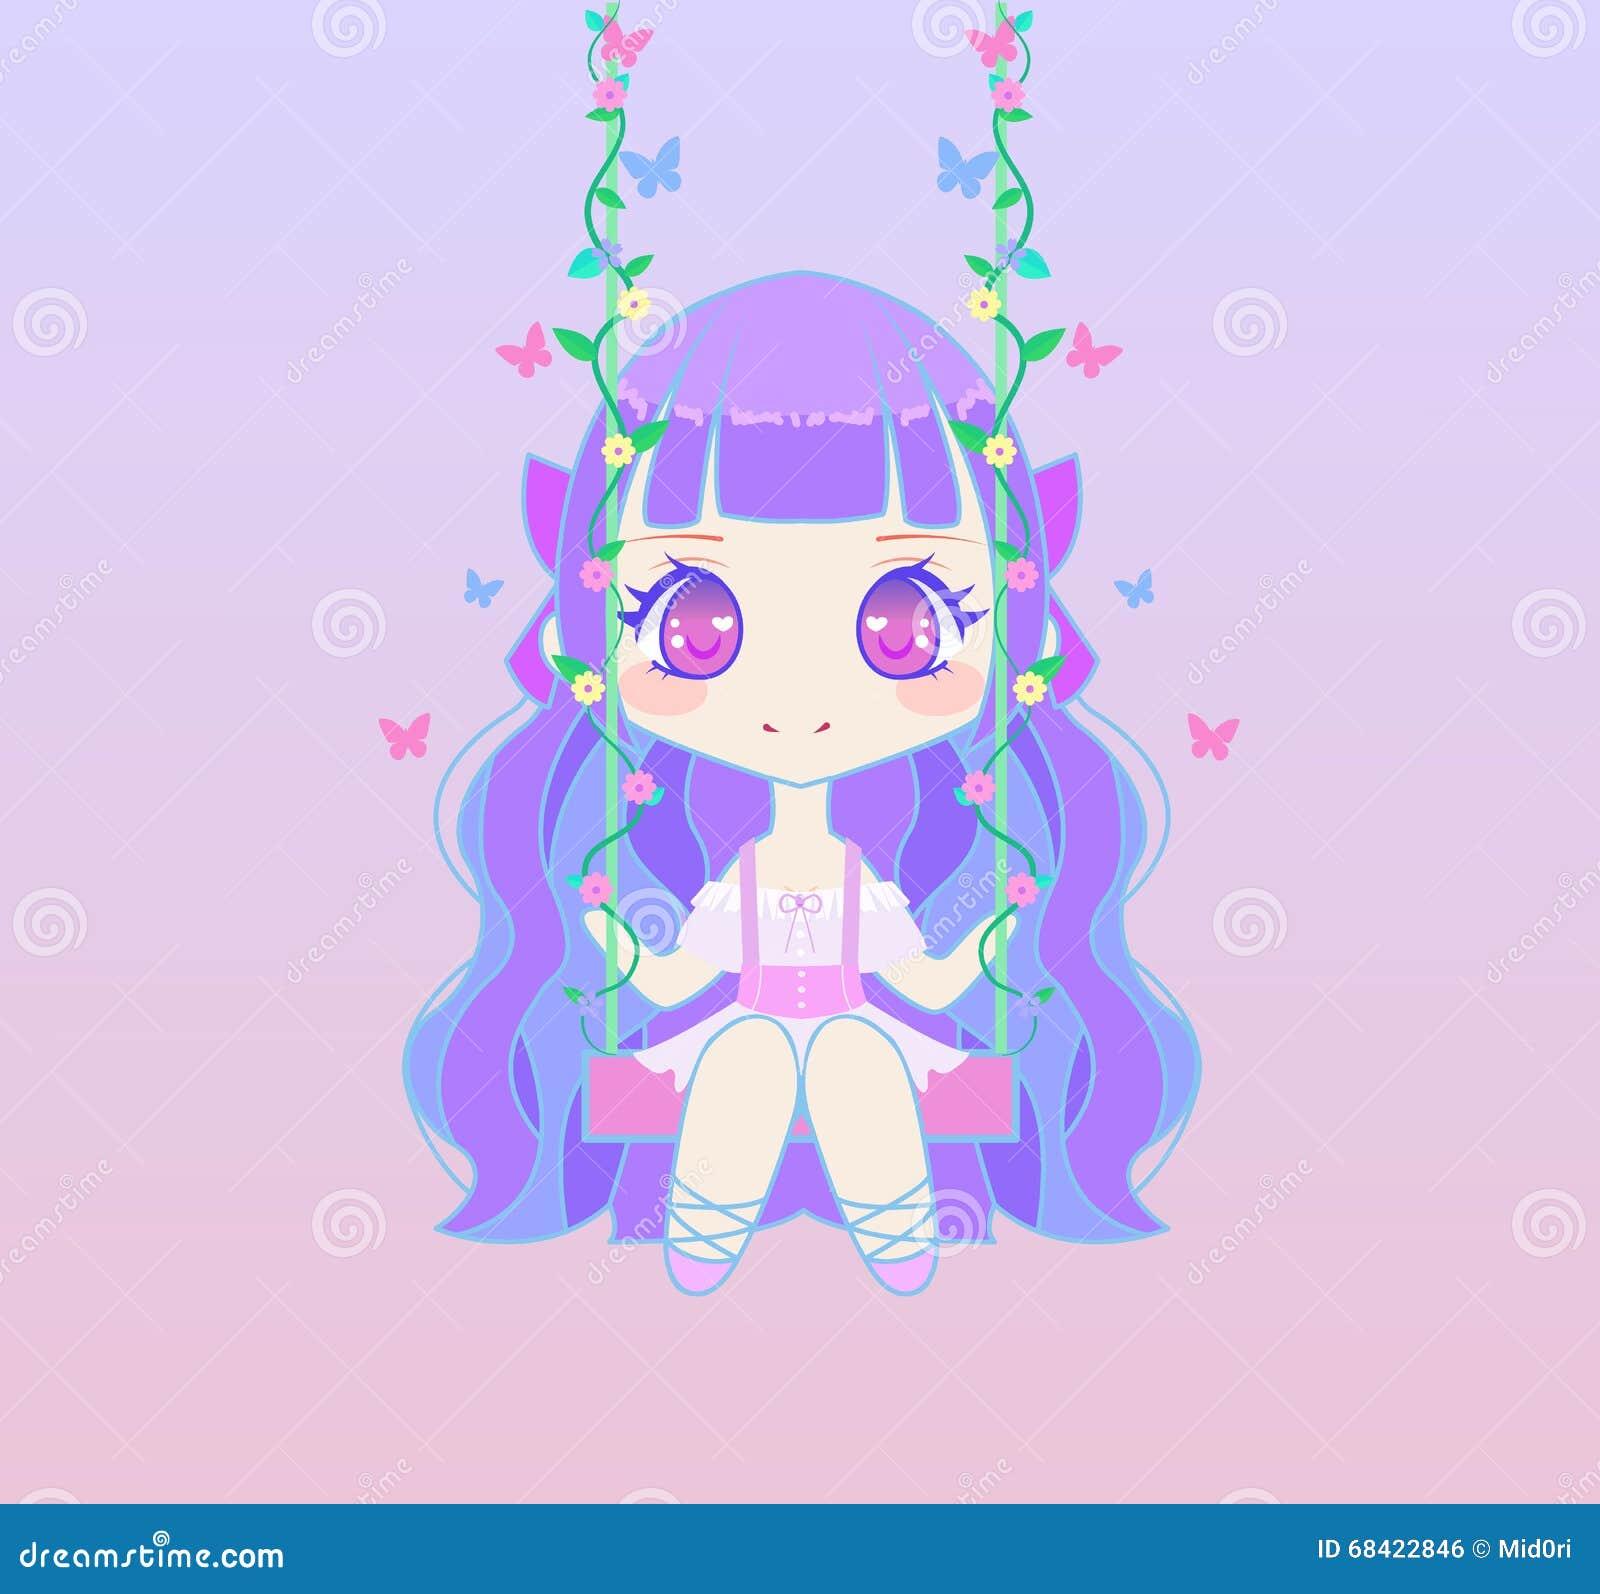 chibi anime girls fairy - photo #31